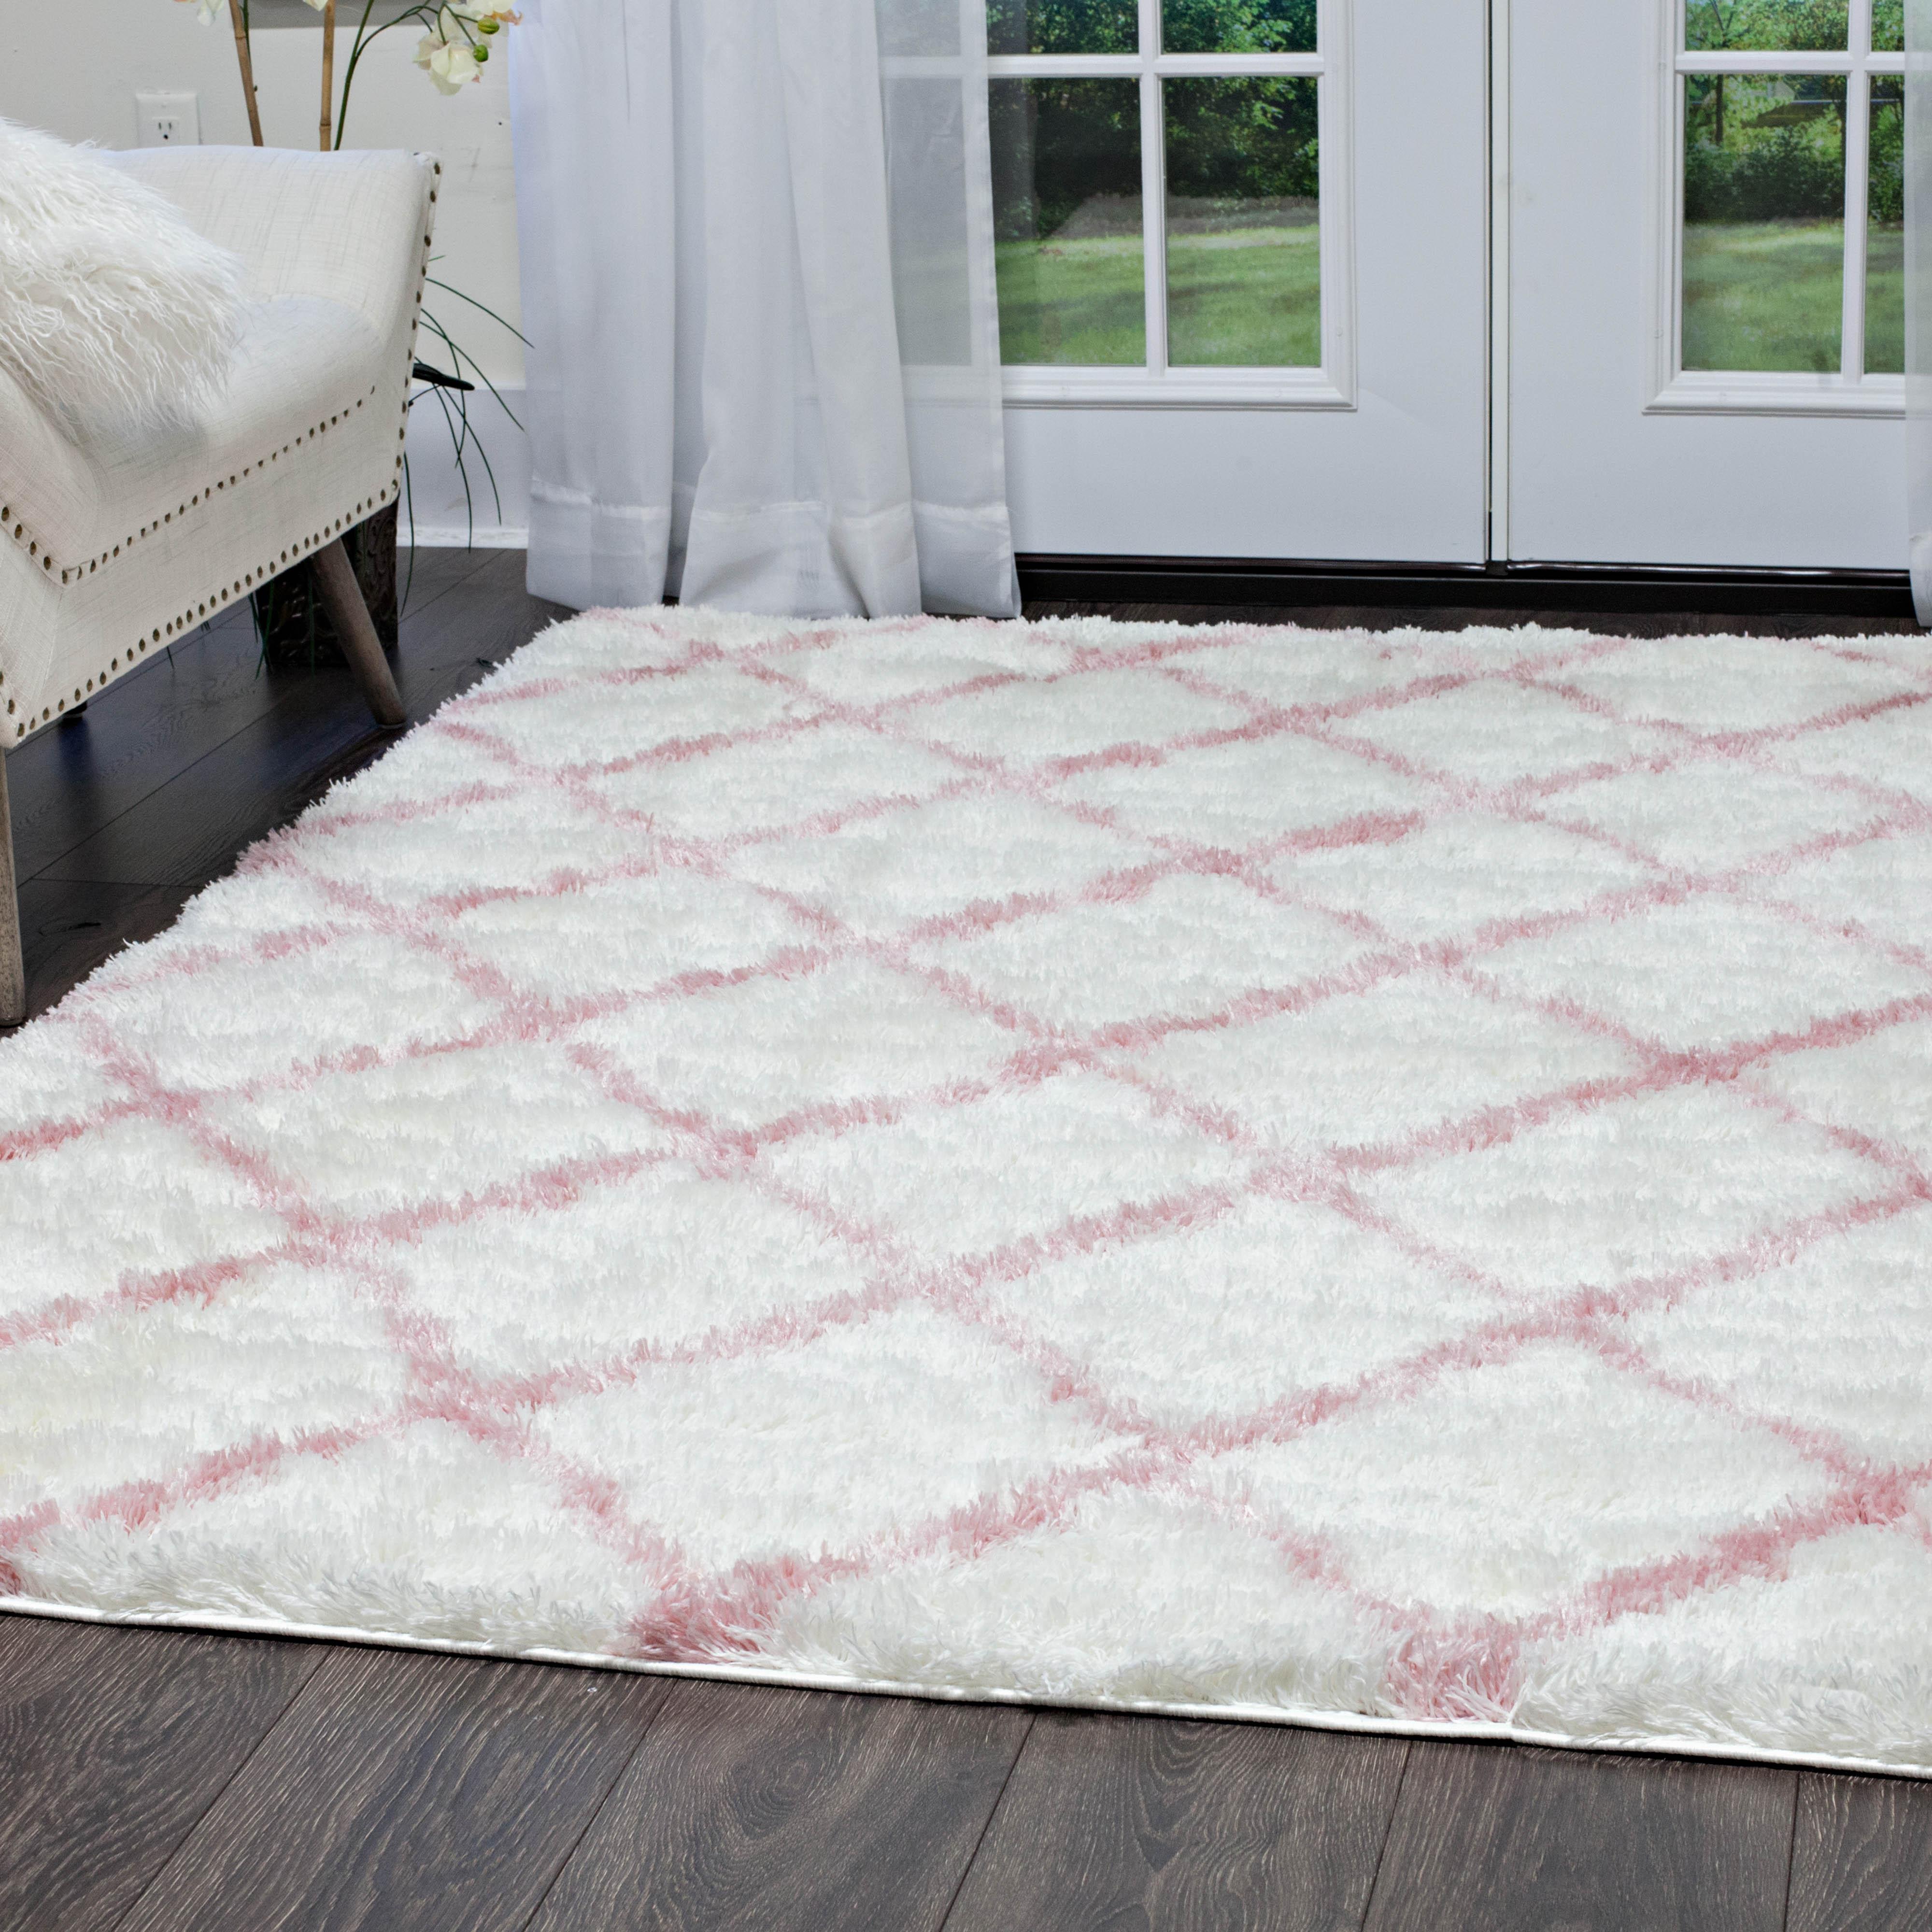 Rugs Area Shag Rug Modern Moroccan Trellis Lattice Floor